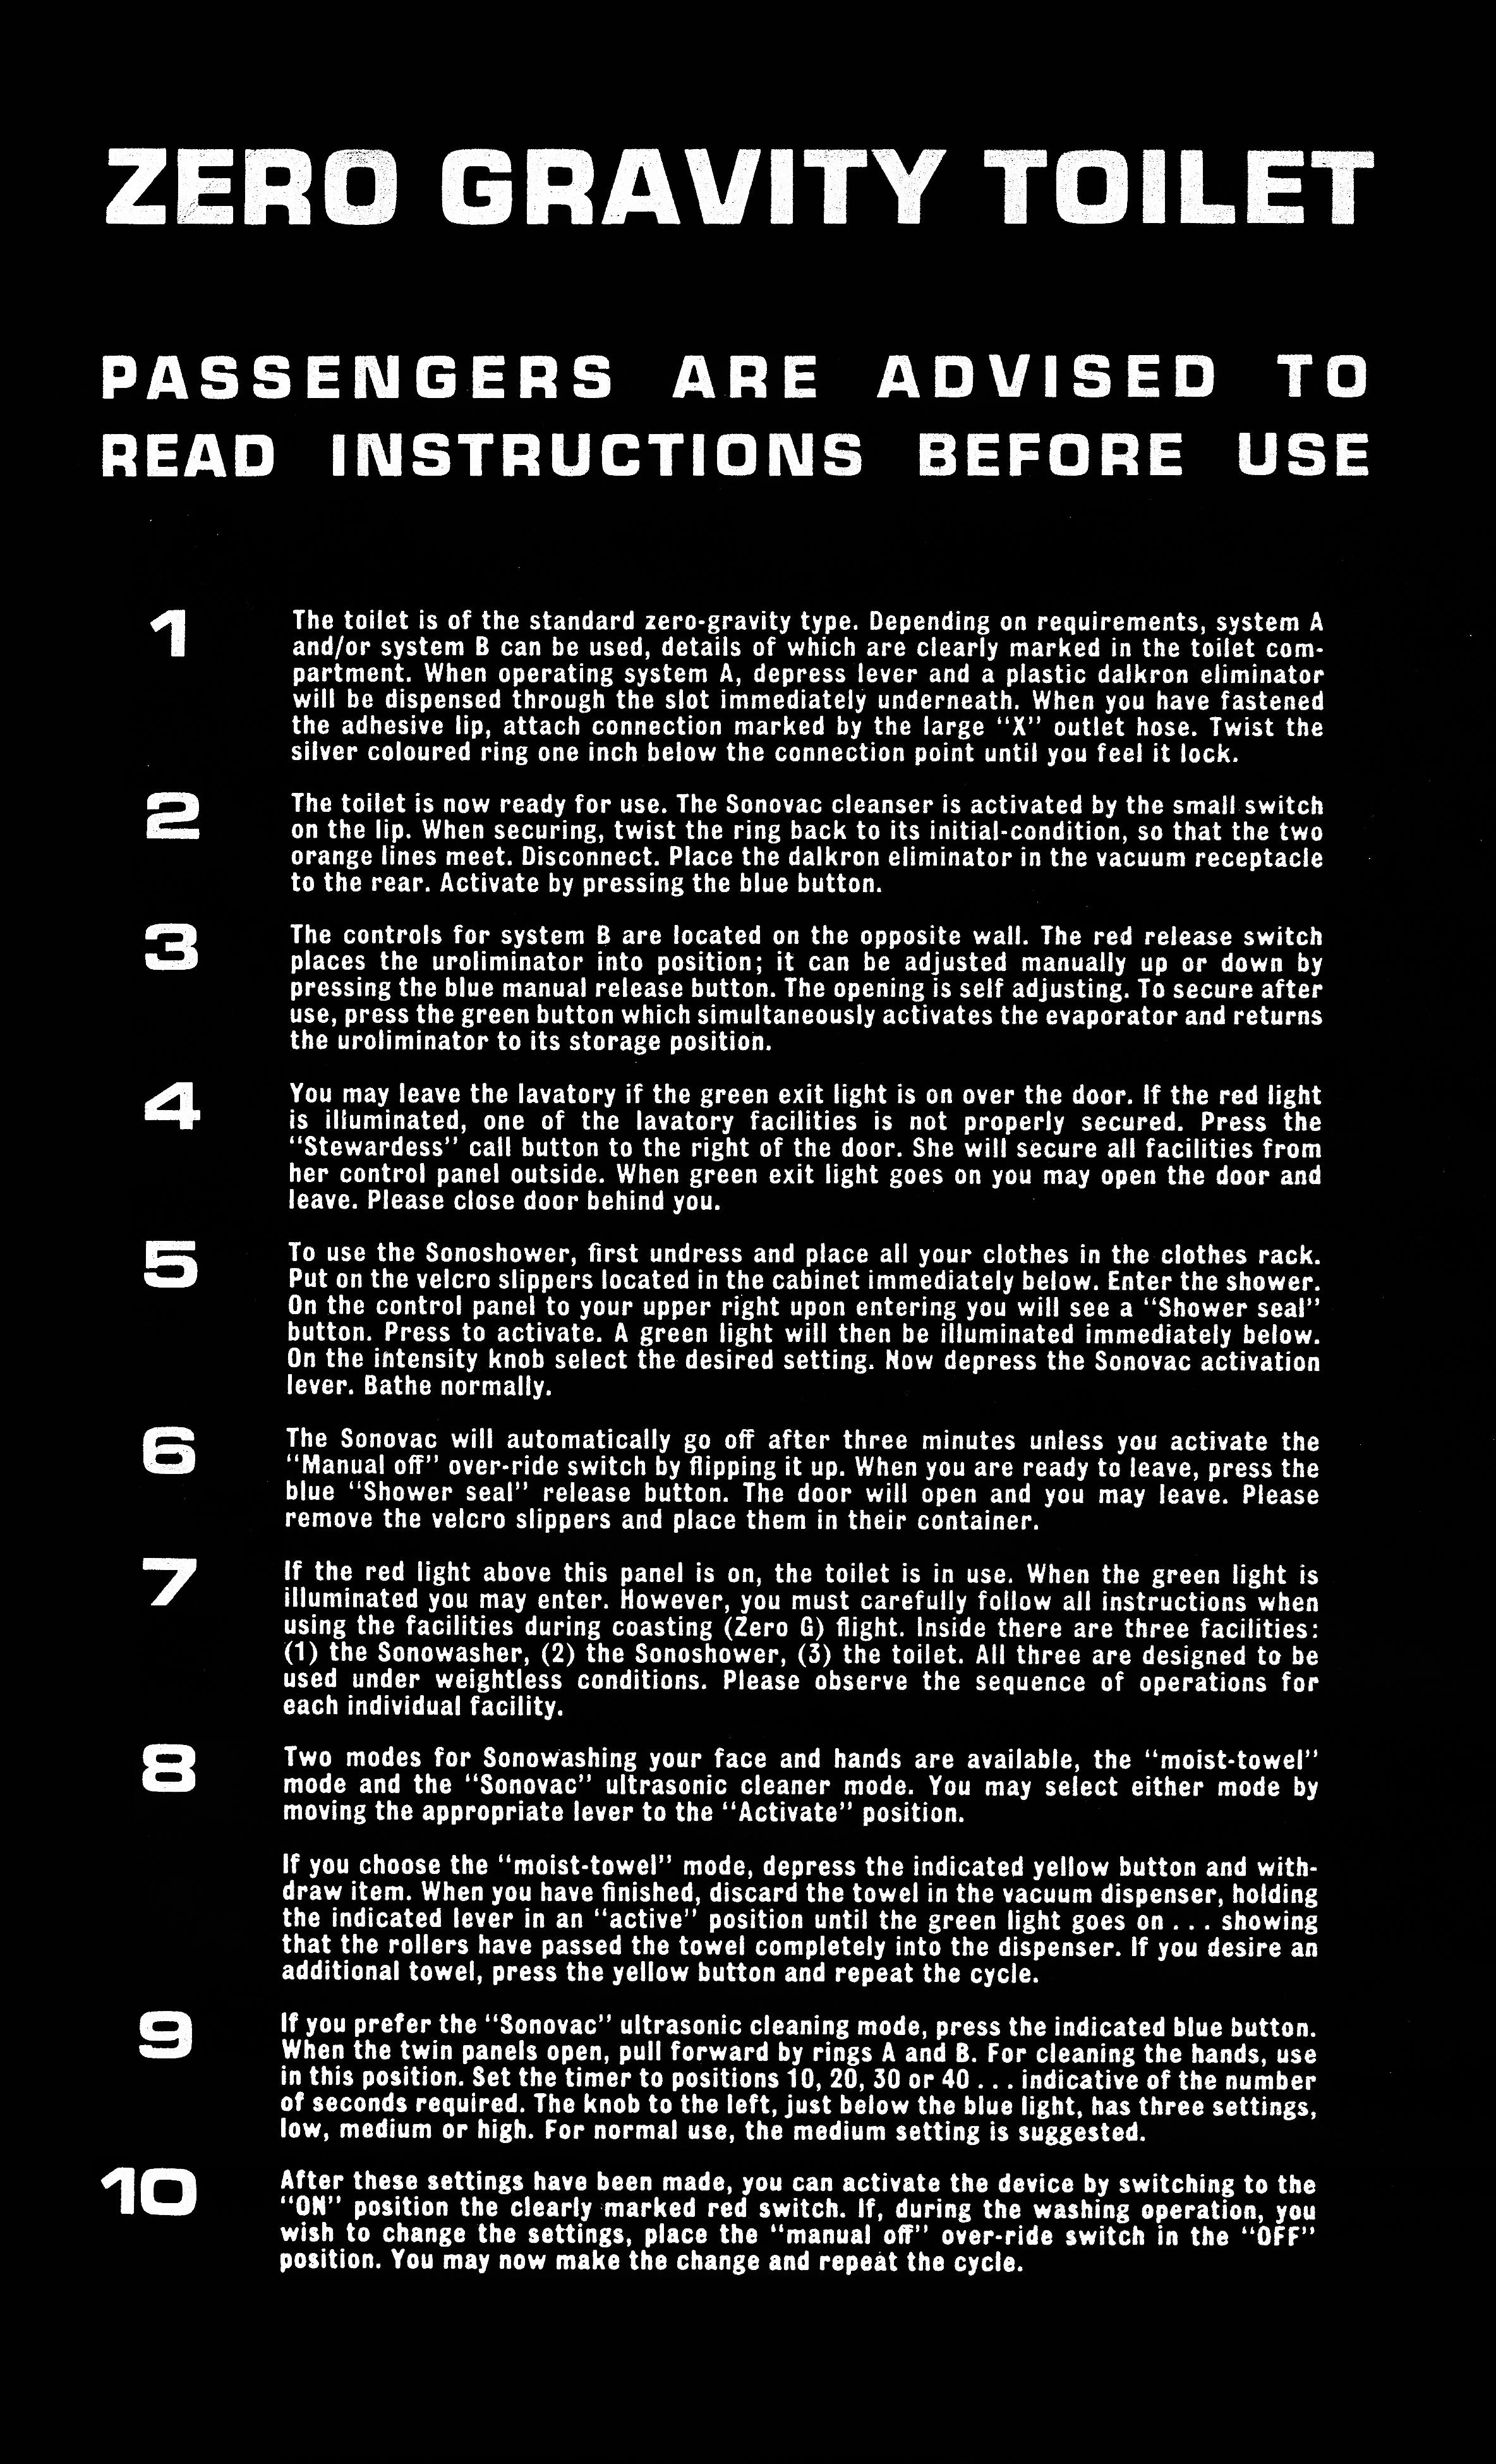 zero gravity toilet instructions poster